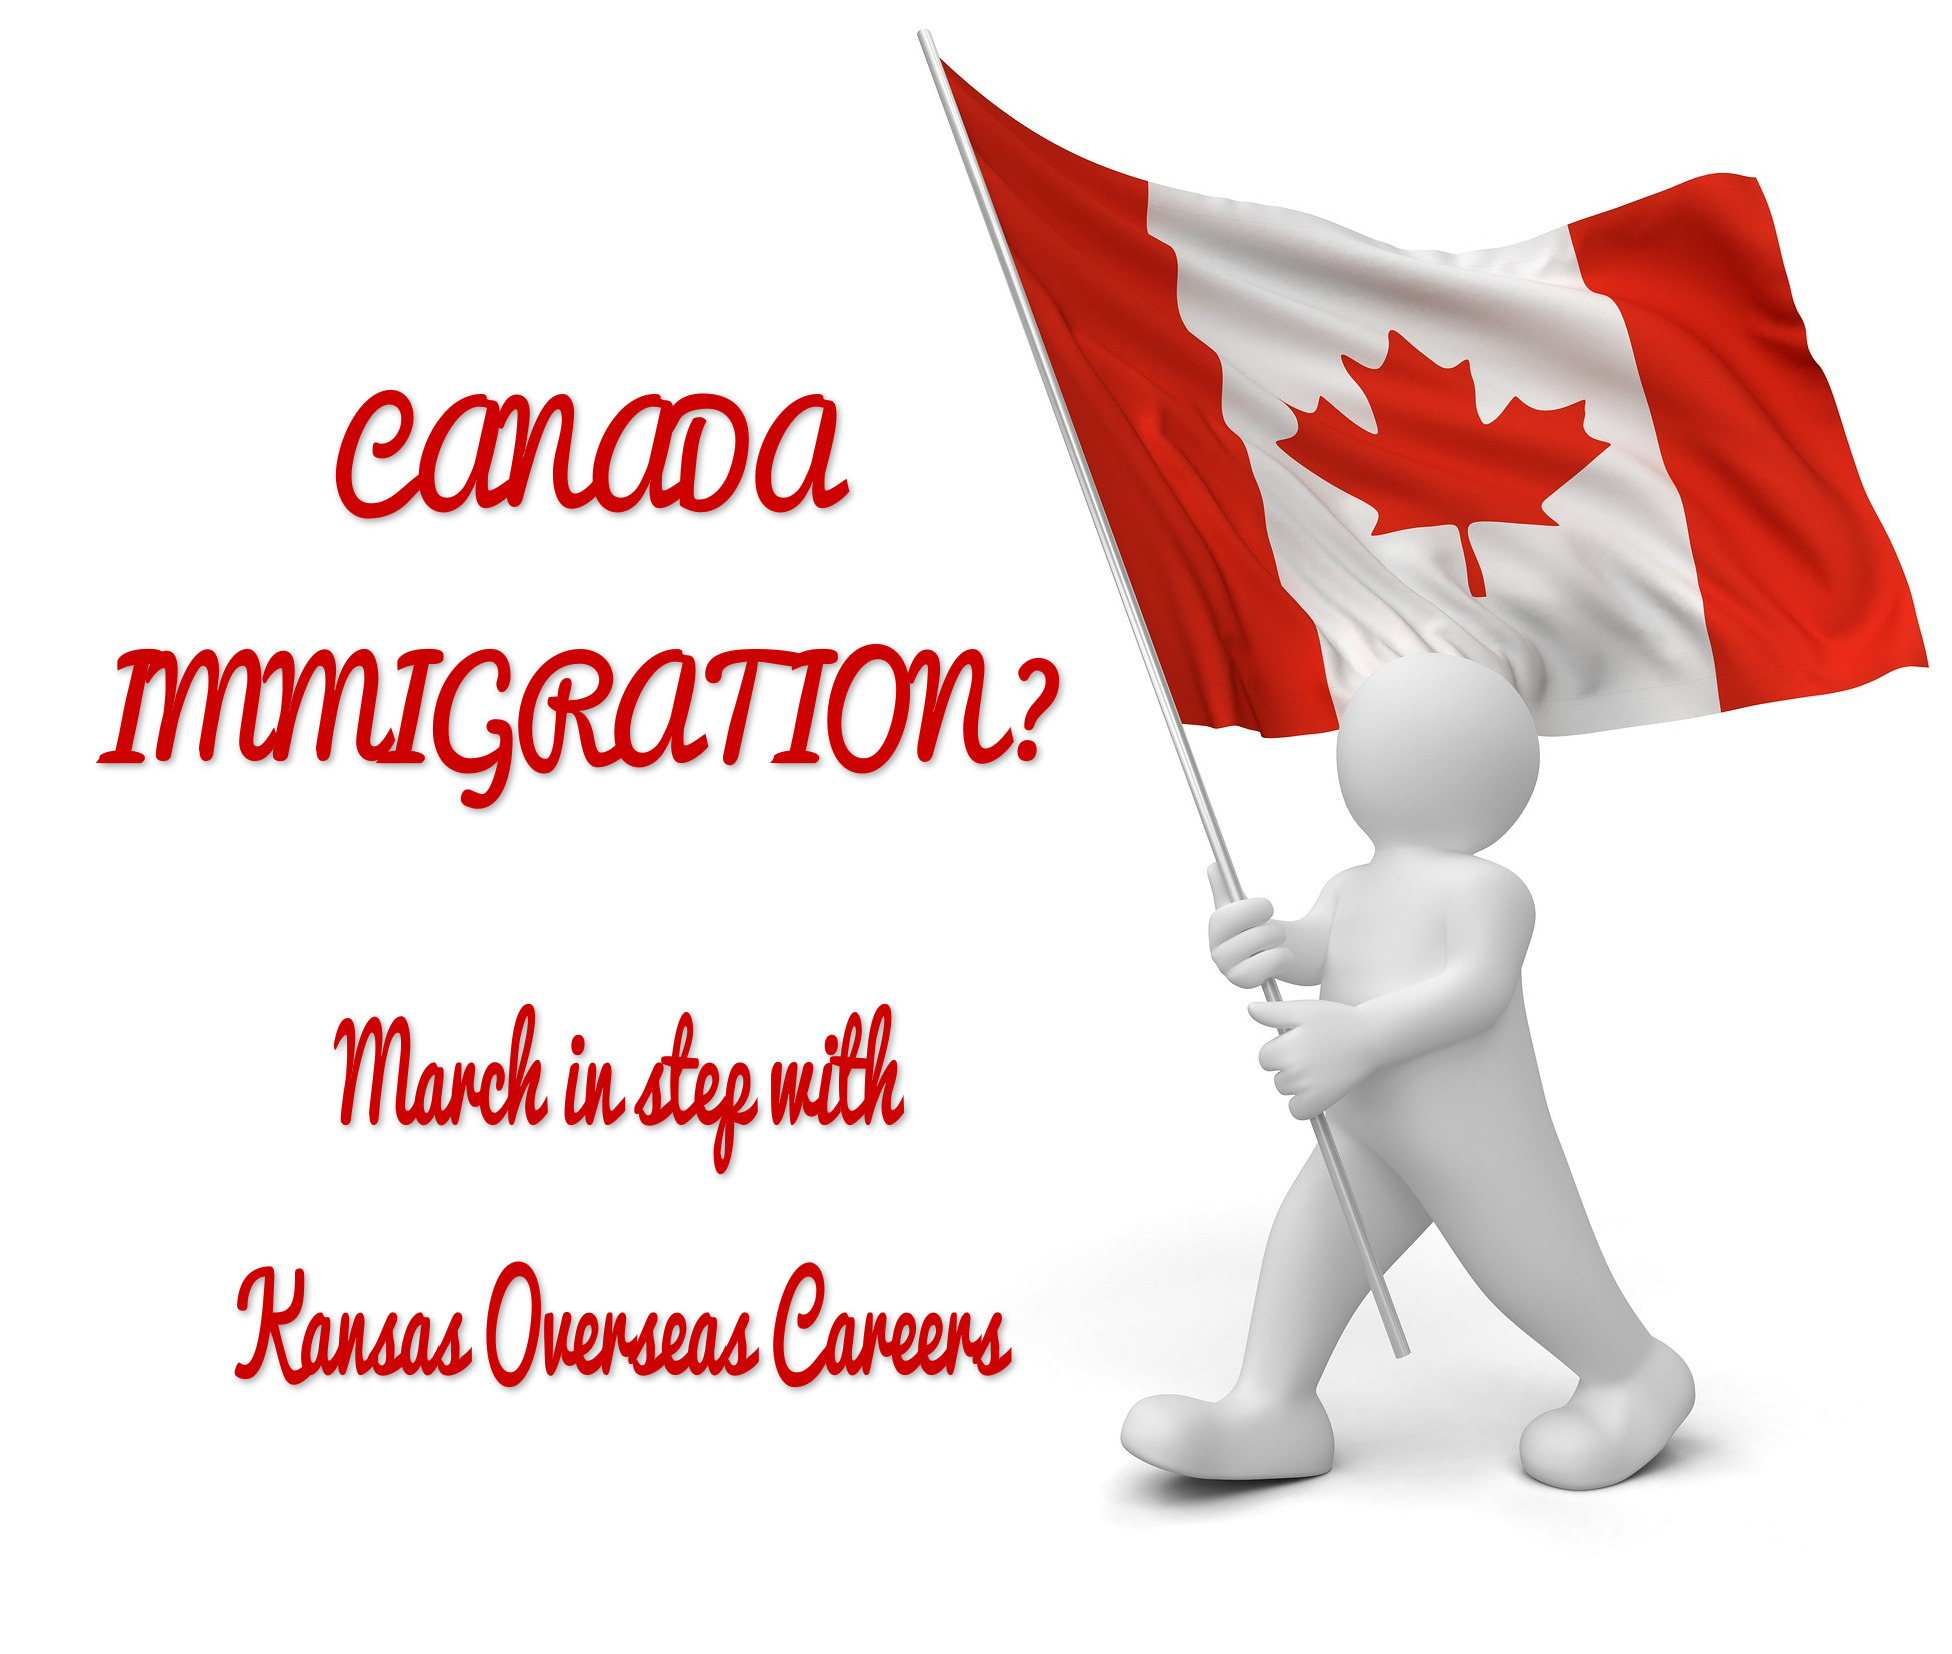 career in Canada